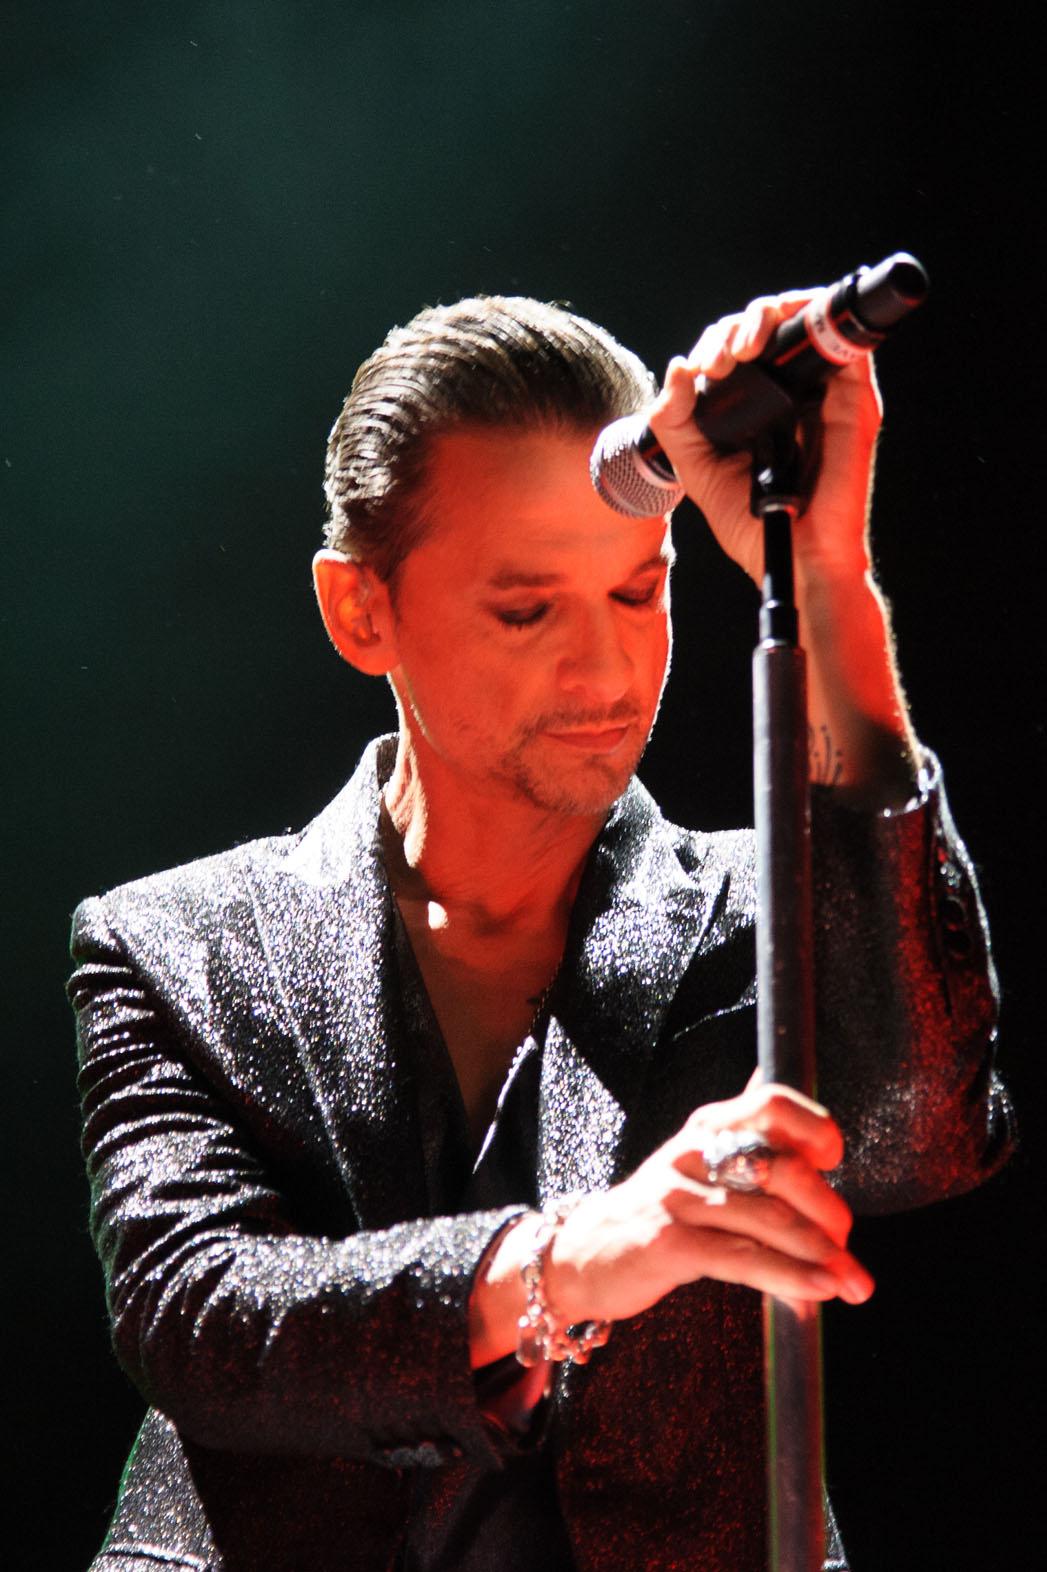 Depeche Mode Performing 9/6 - P 2013